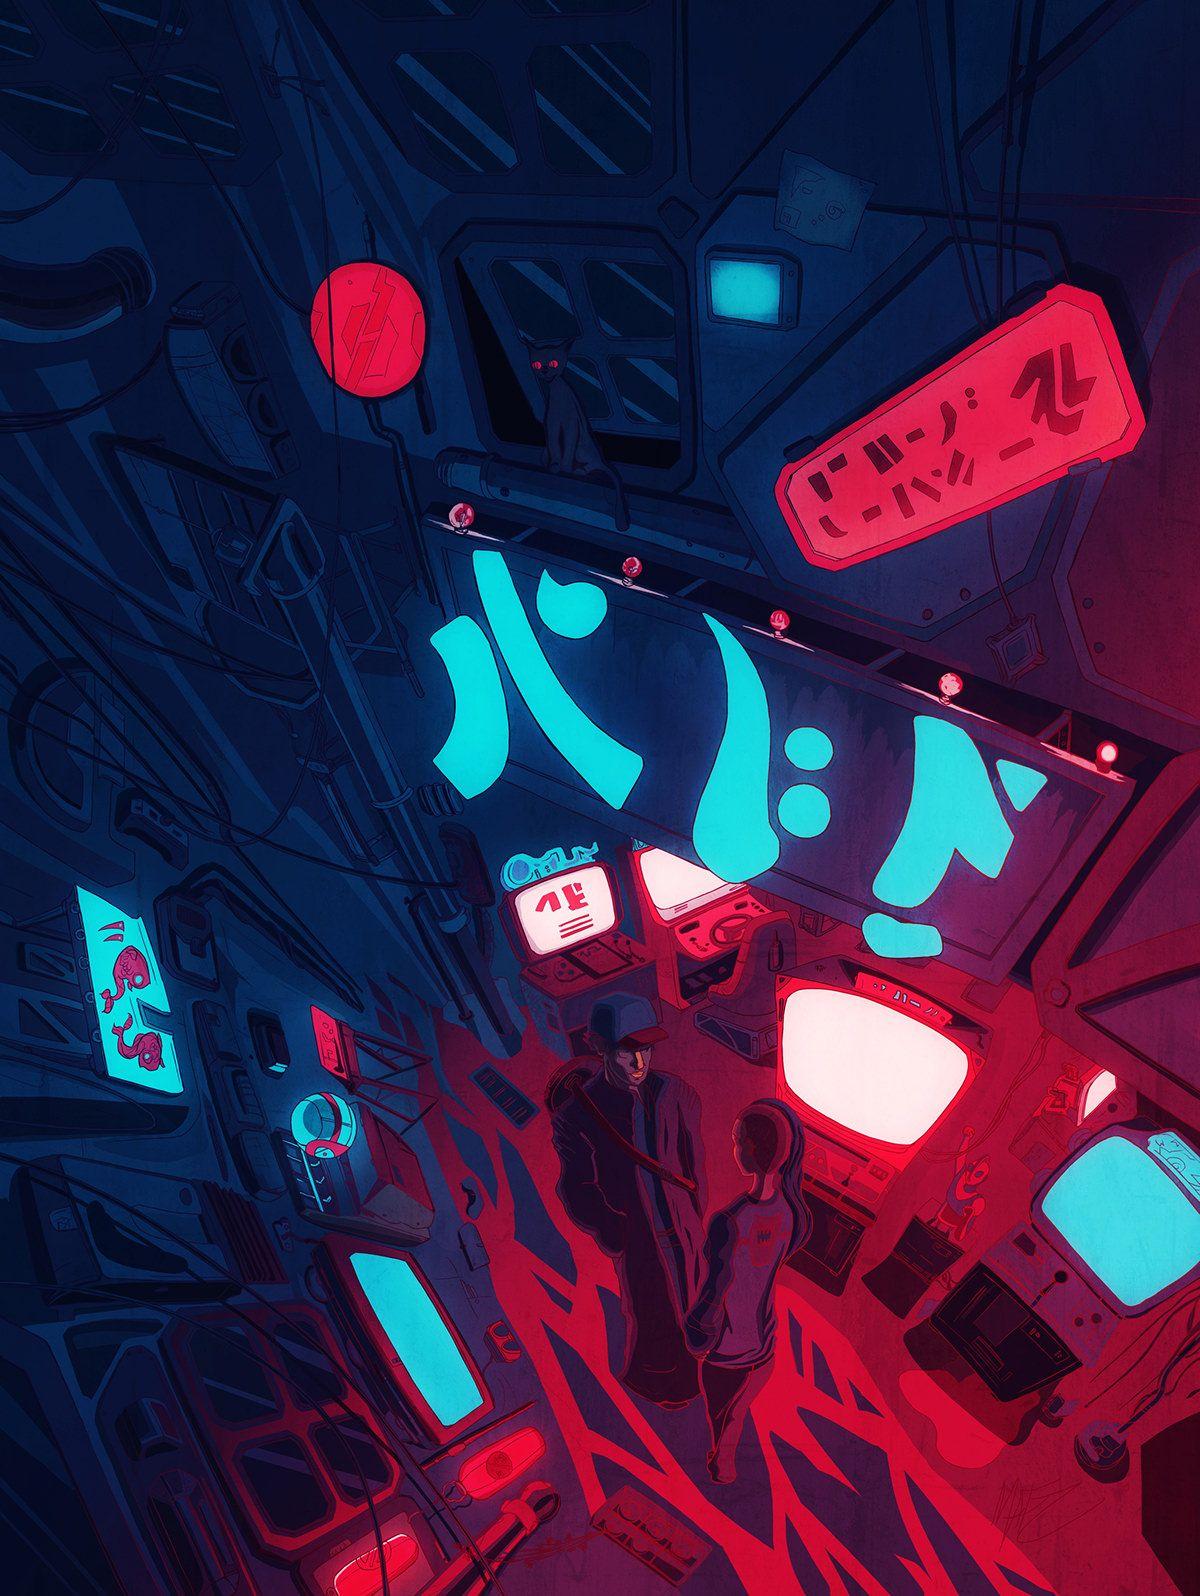 Cyberpunk Anime Pixel Art Cyberpunk Pixel Art Cyberpunk City